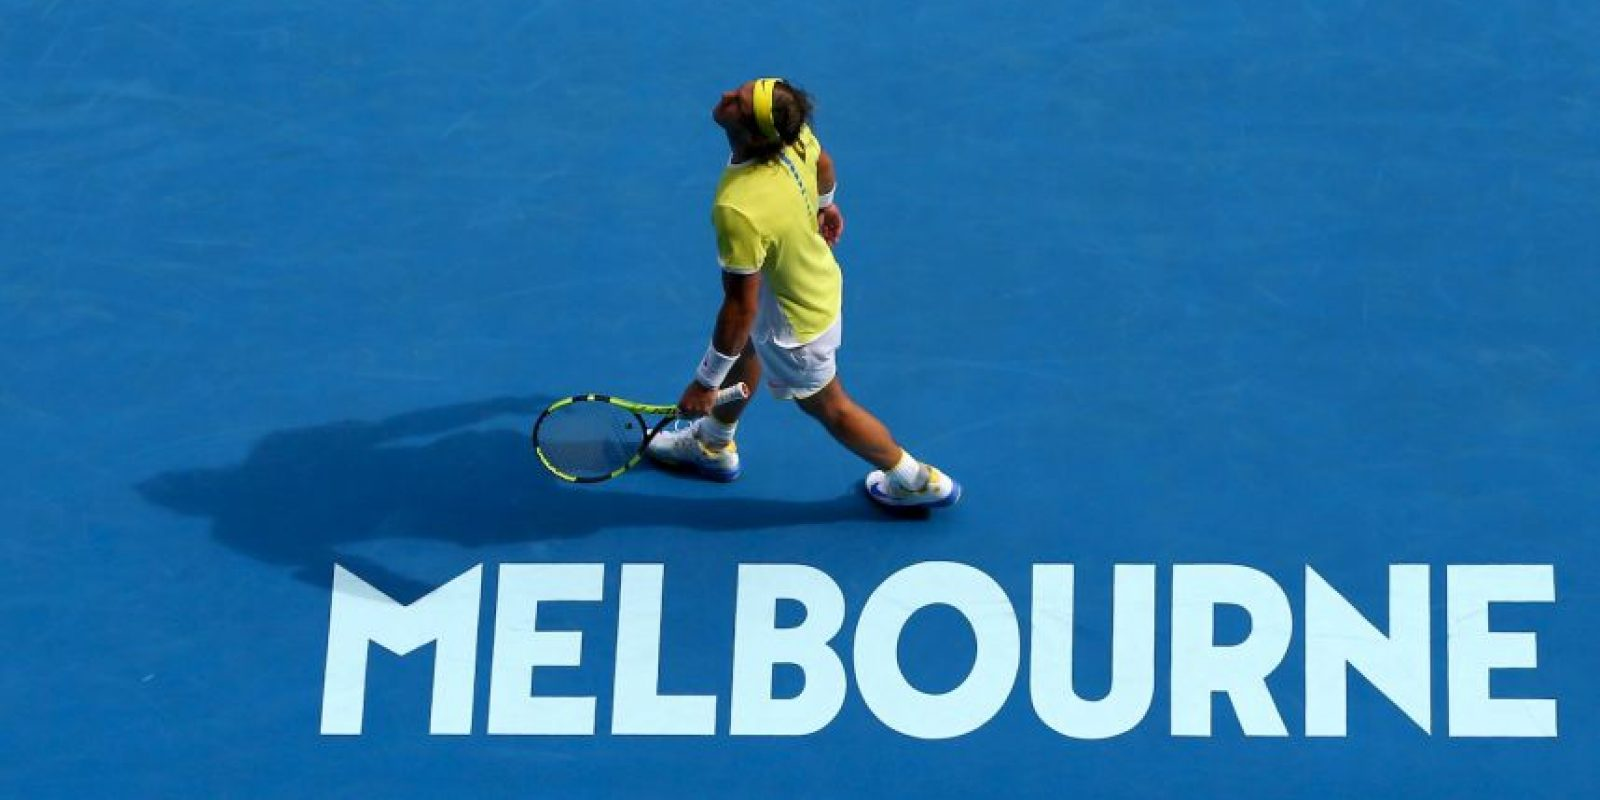 Y tres menos que Roger Federer Foto:Getty Images